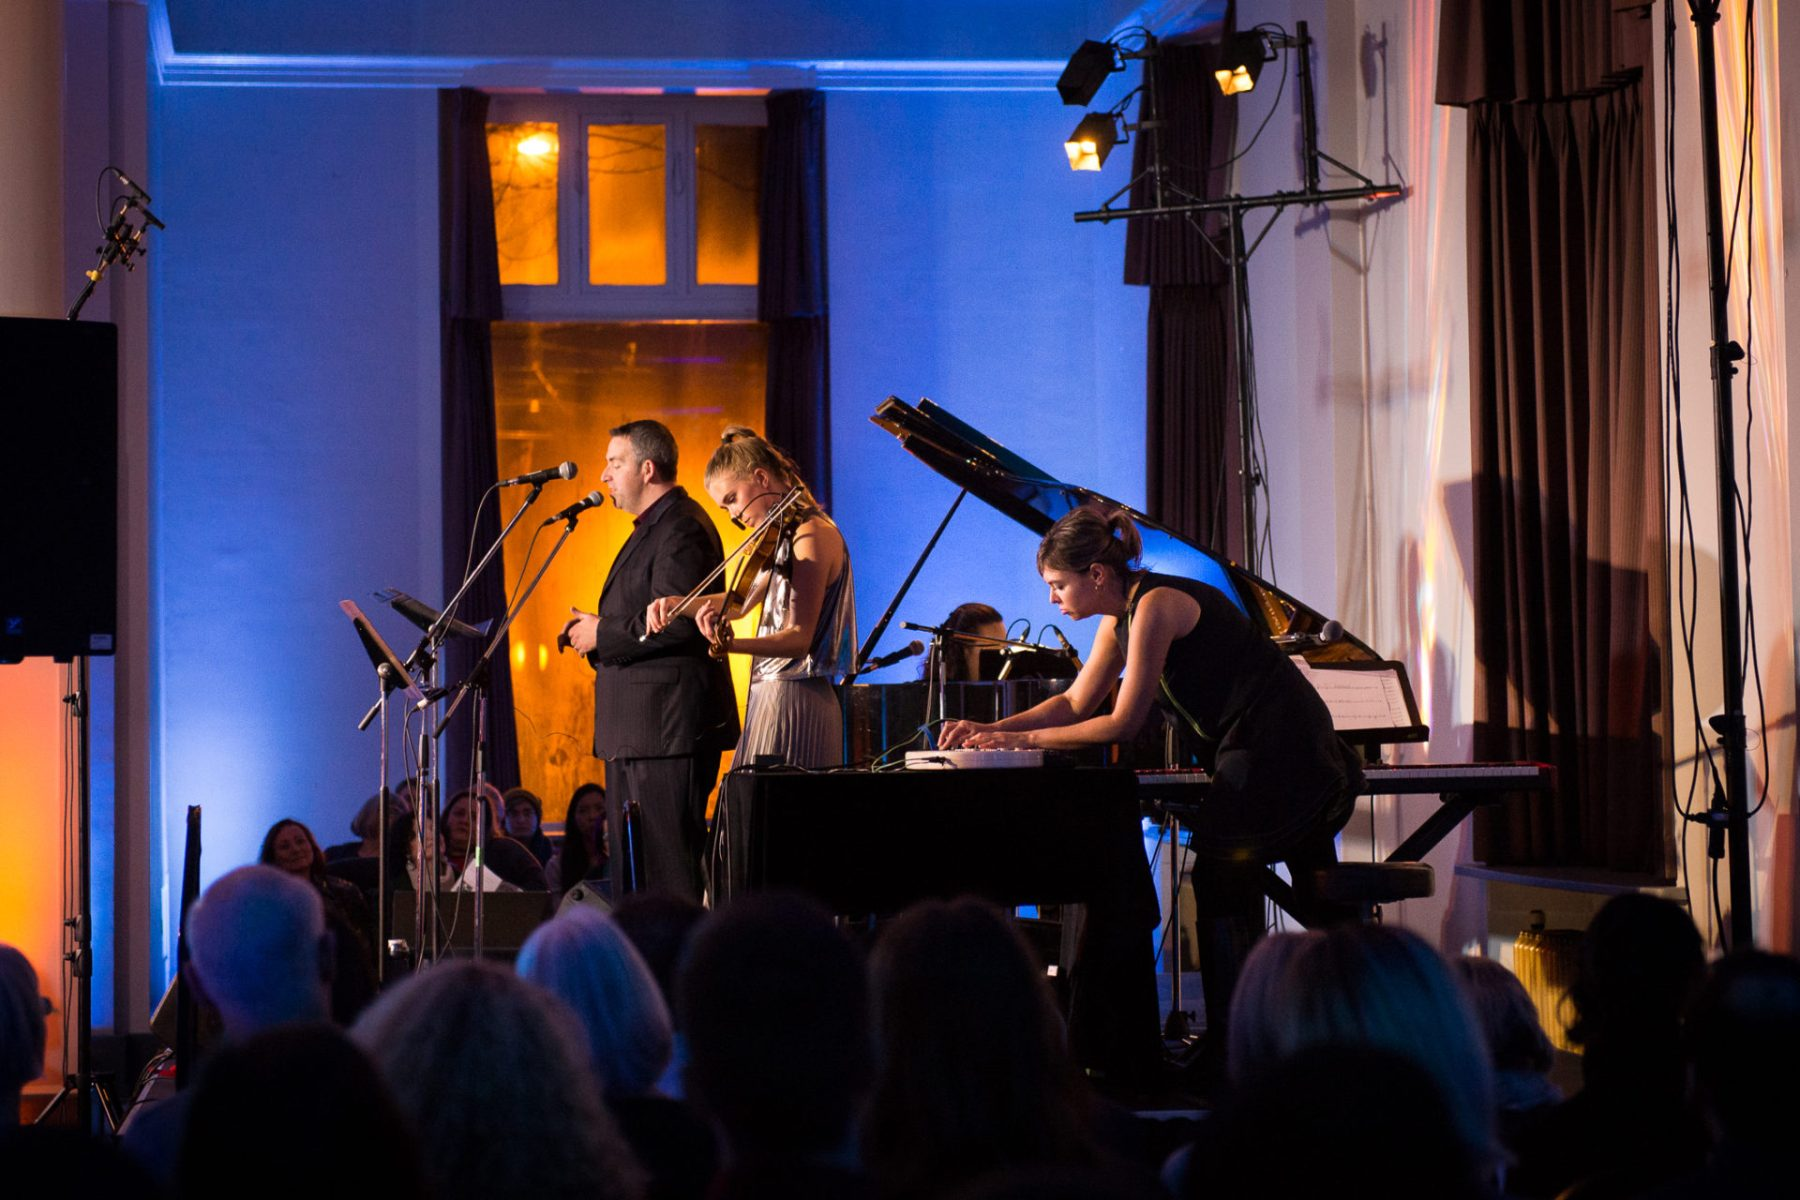 Nicole Lizée, Carman J. Price, Wallgrin & Rachel Kiyo Iwaasa, Music for the Winter Solstice 2017